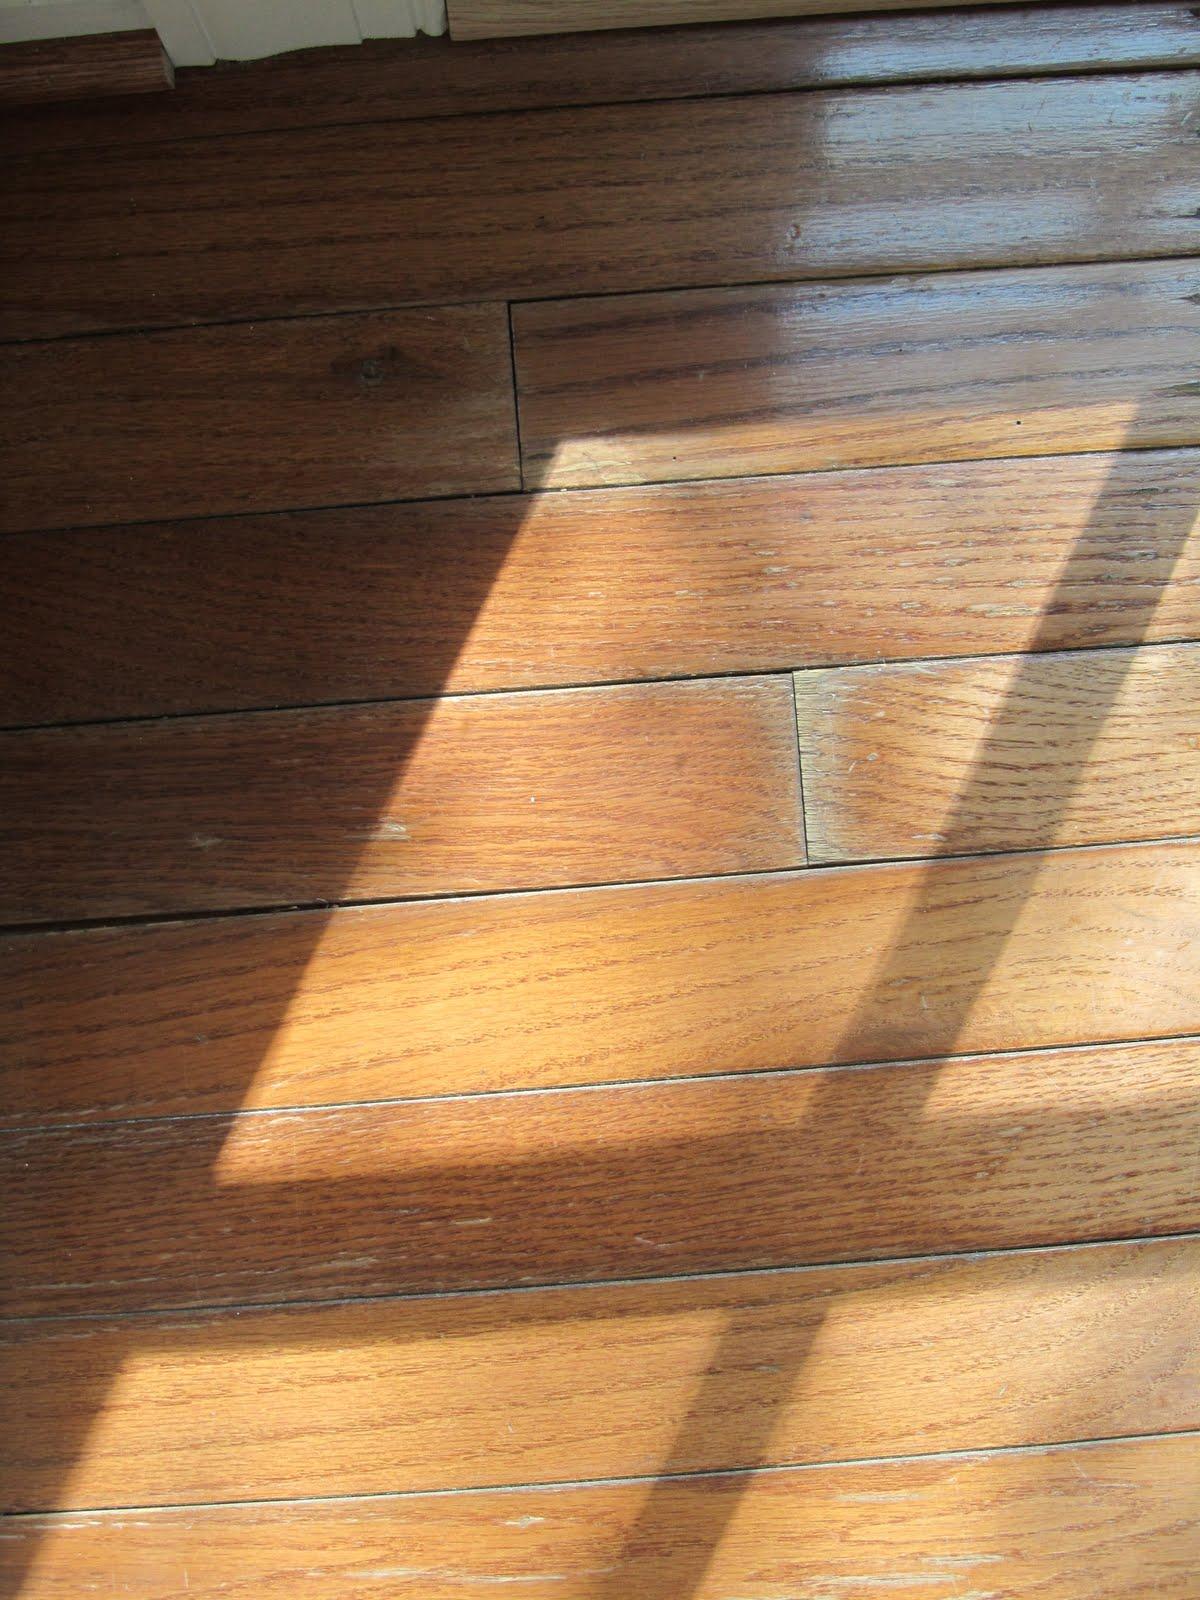 Rug pads for hardwood floors flooring ideas home for Wood floor under carpet